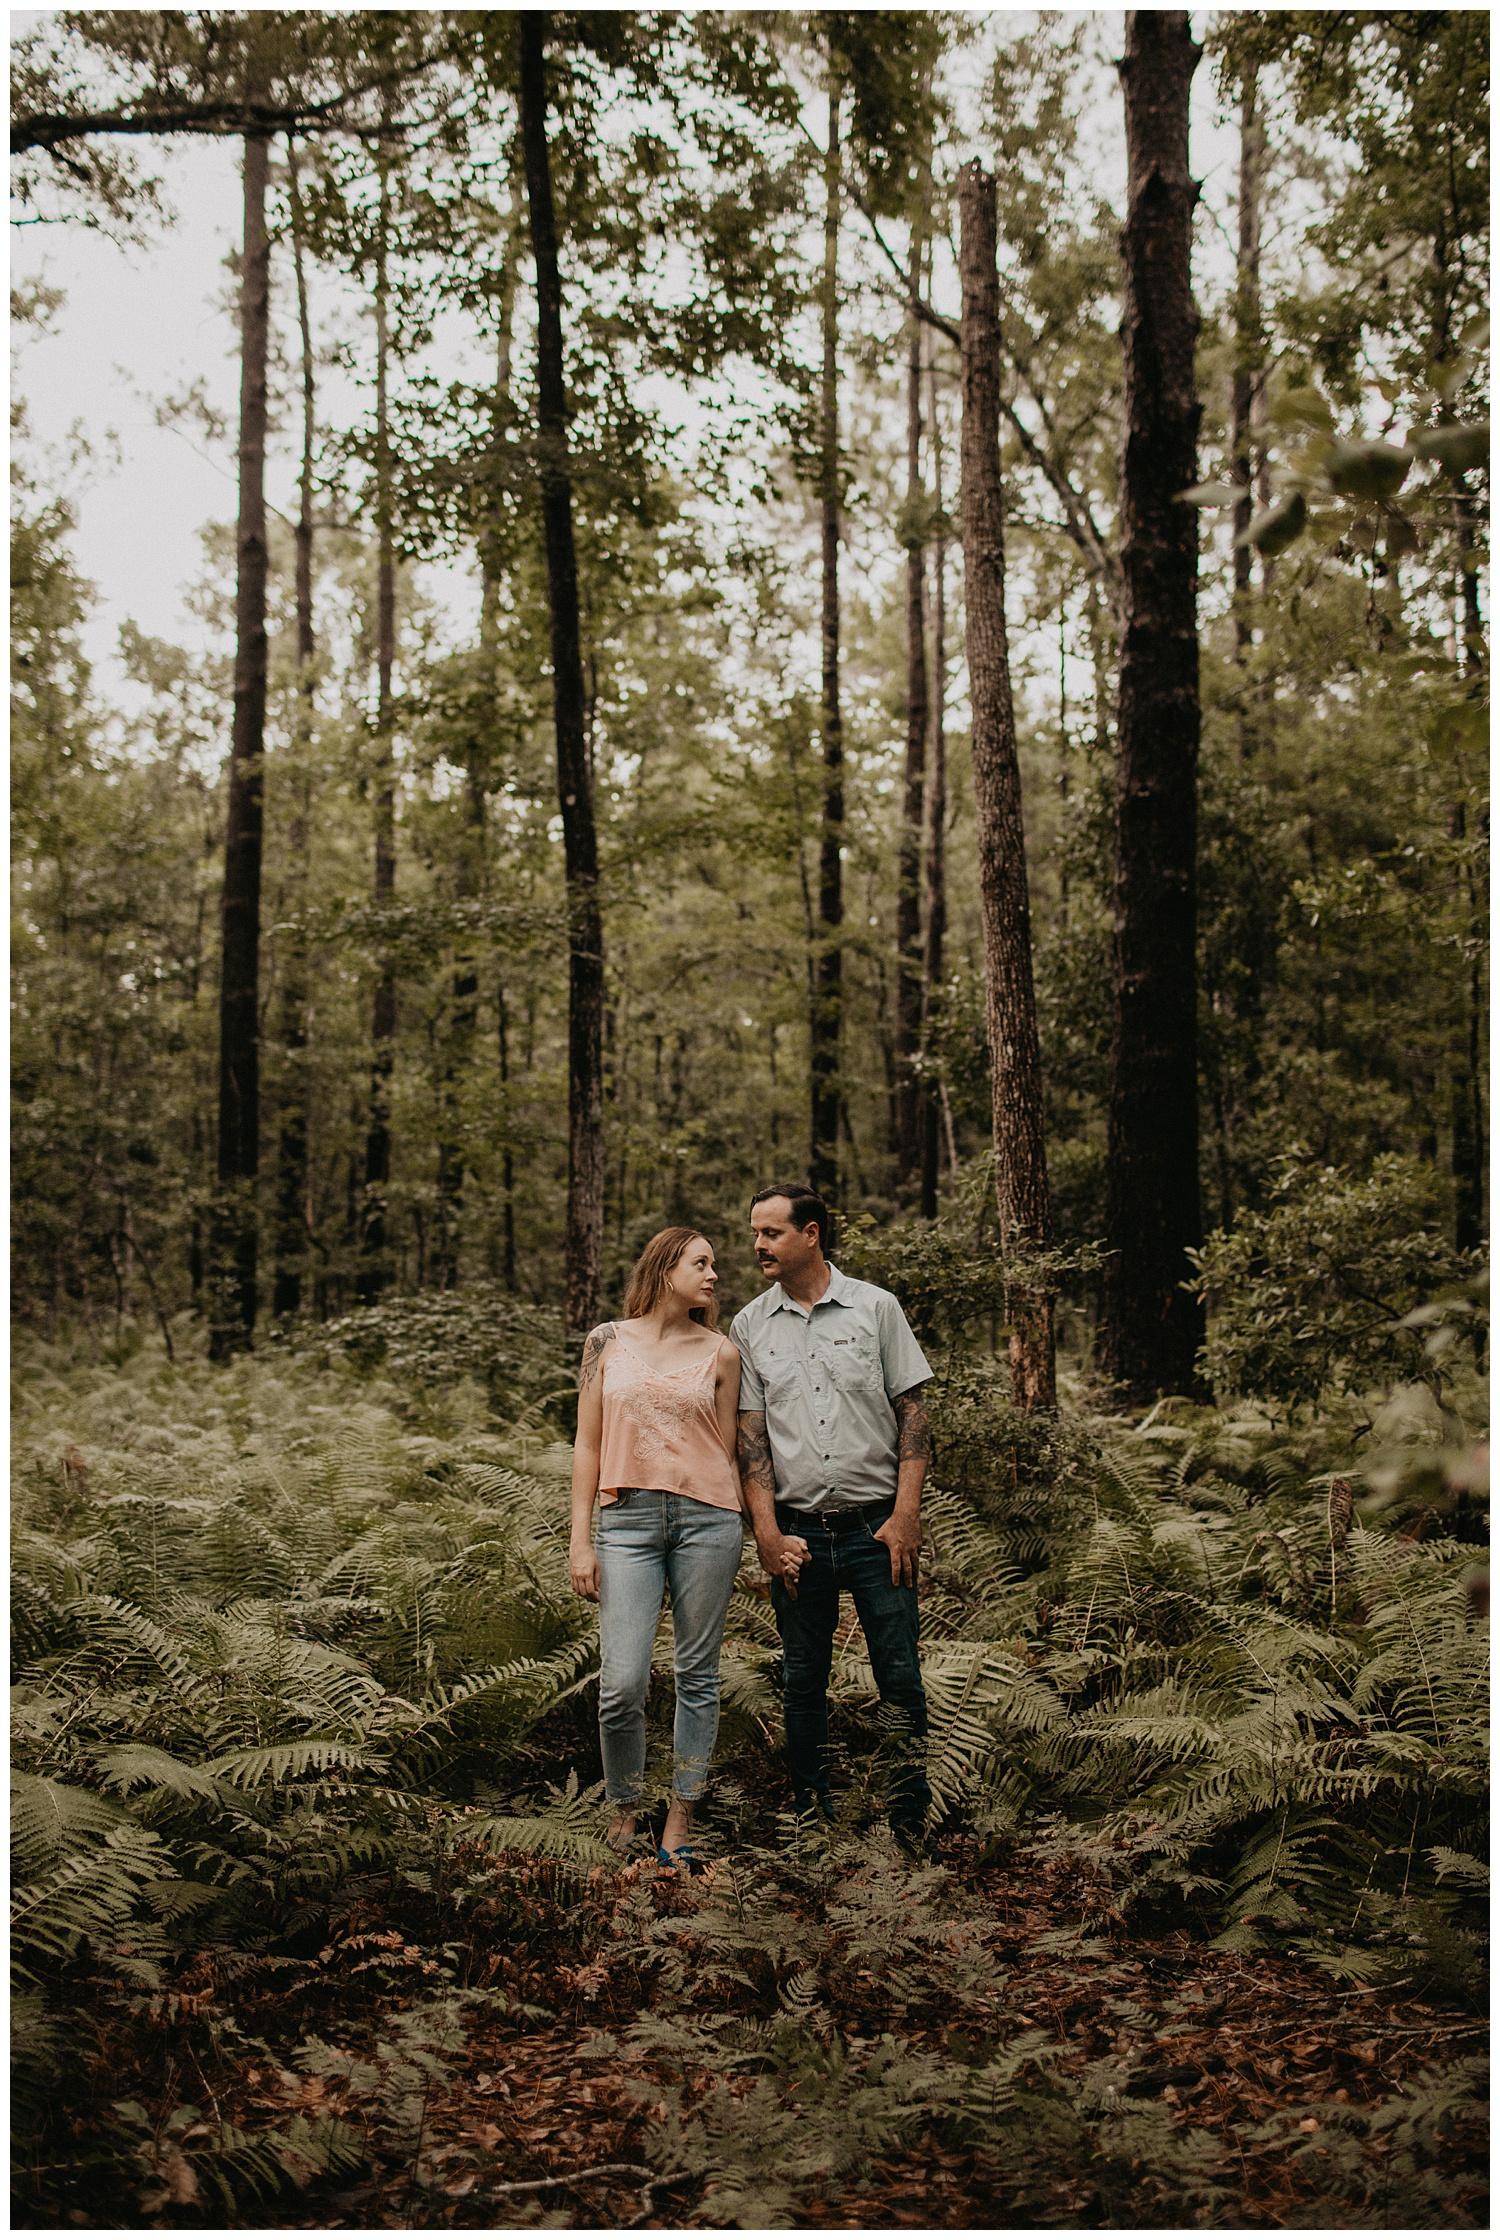 tillie-fowler-park-engagement-jacksonville-florida_0684.jpg